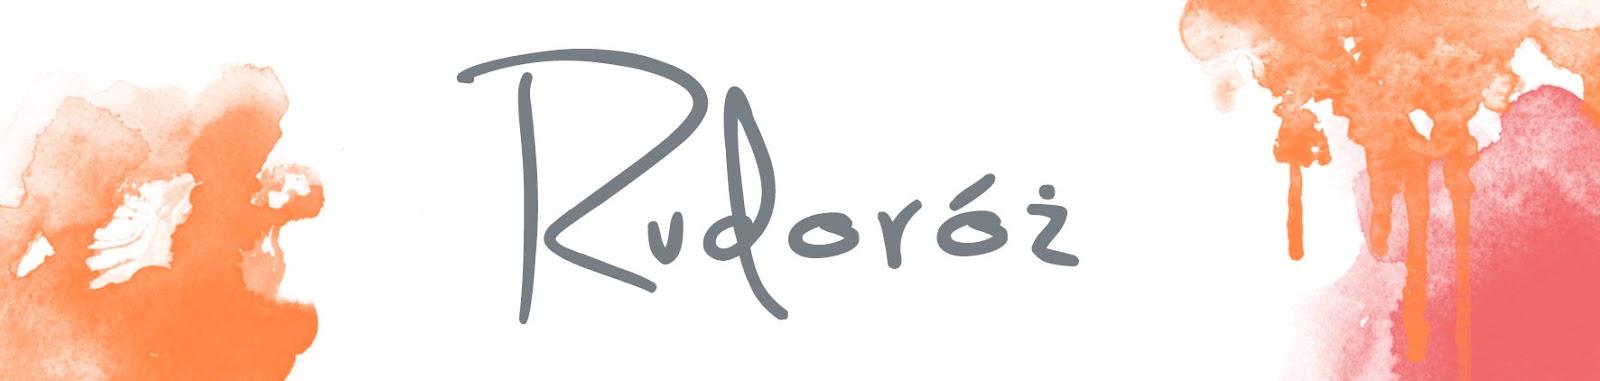 http://www.rudoroz.pl/